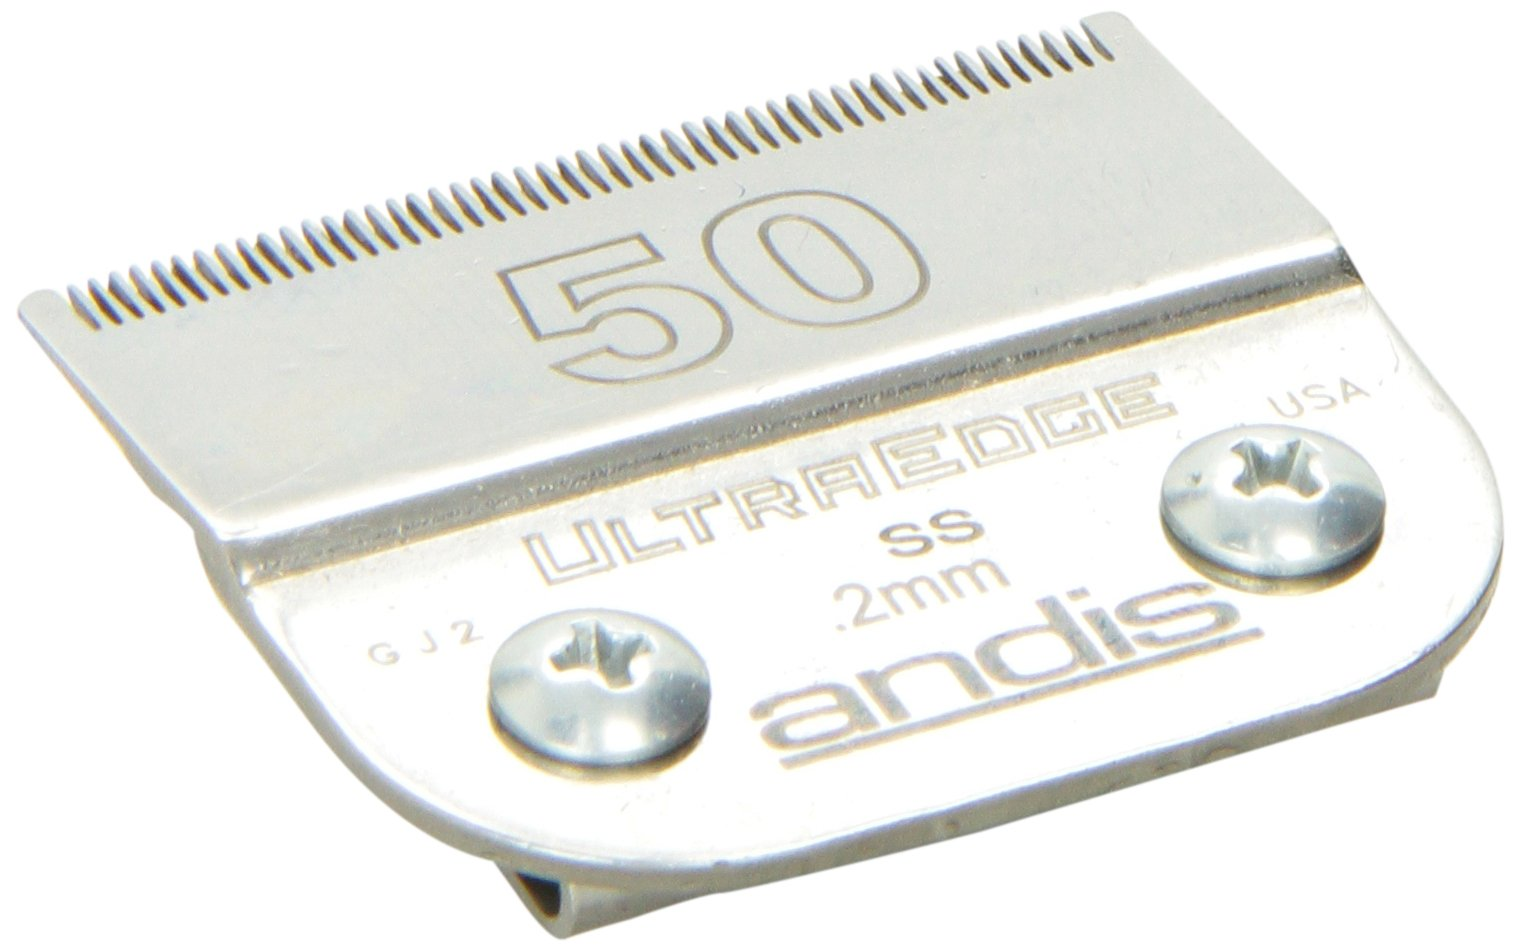 Cuchillas : Andis 50 Ultra Edge 64185 Reemplazo